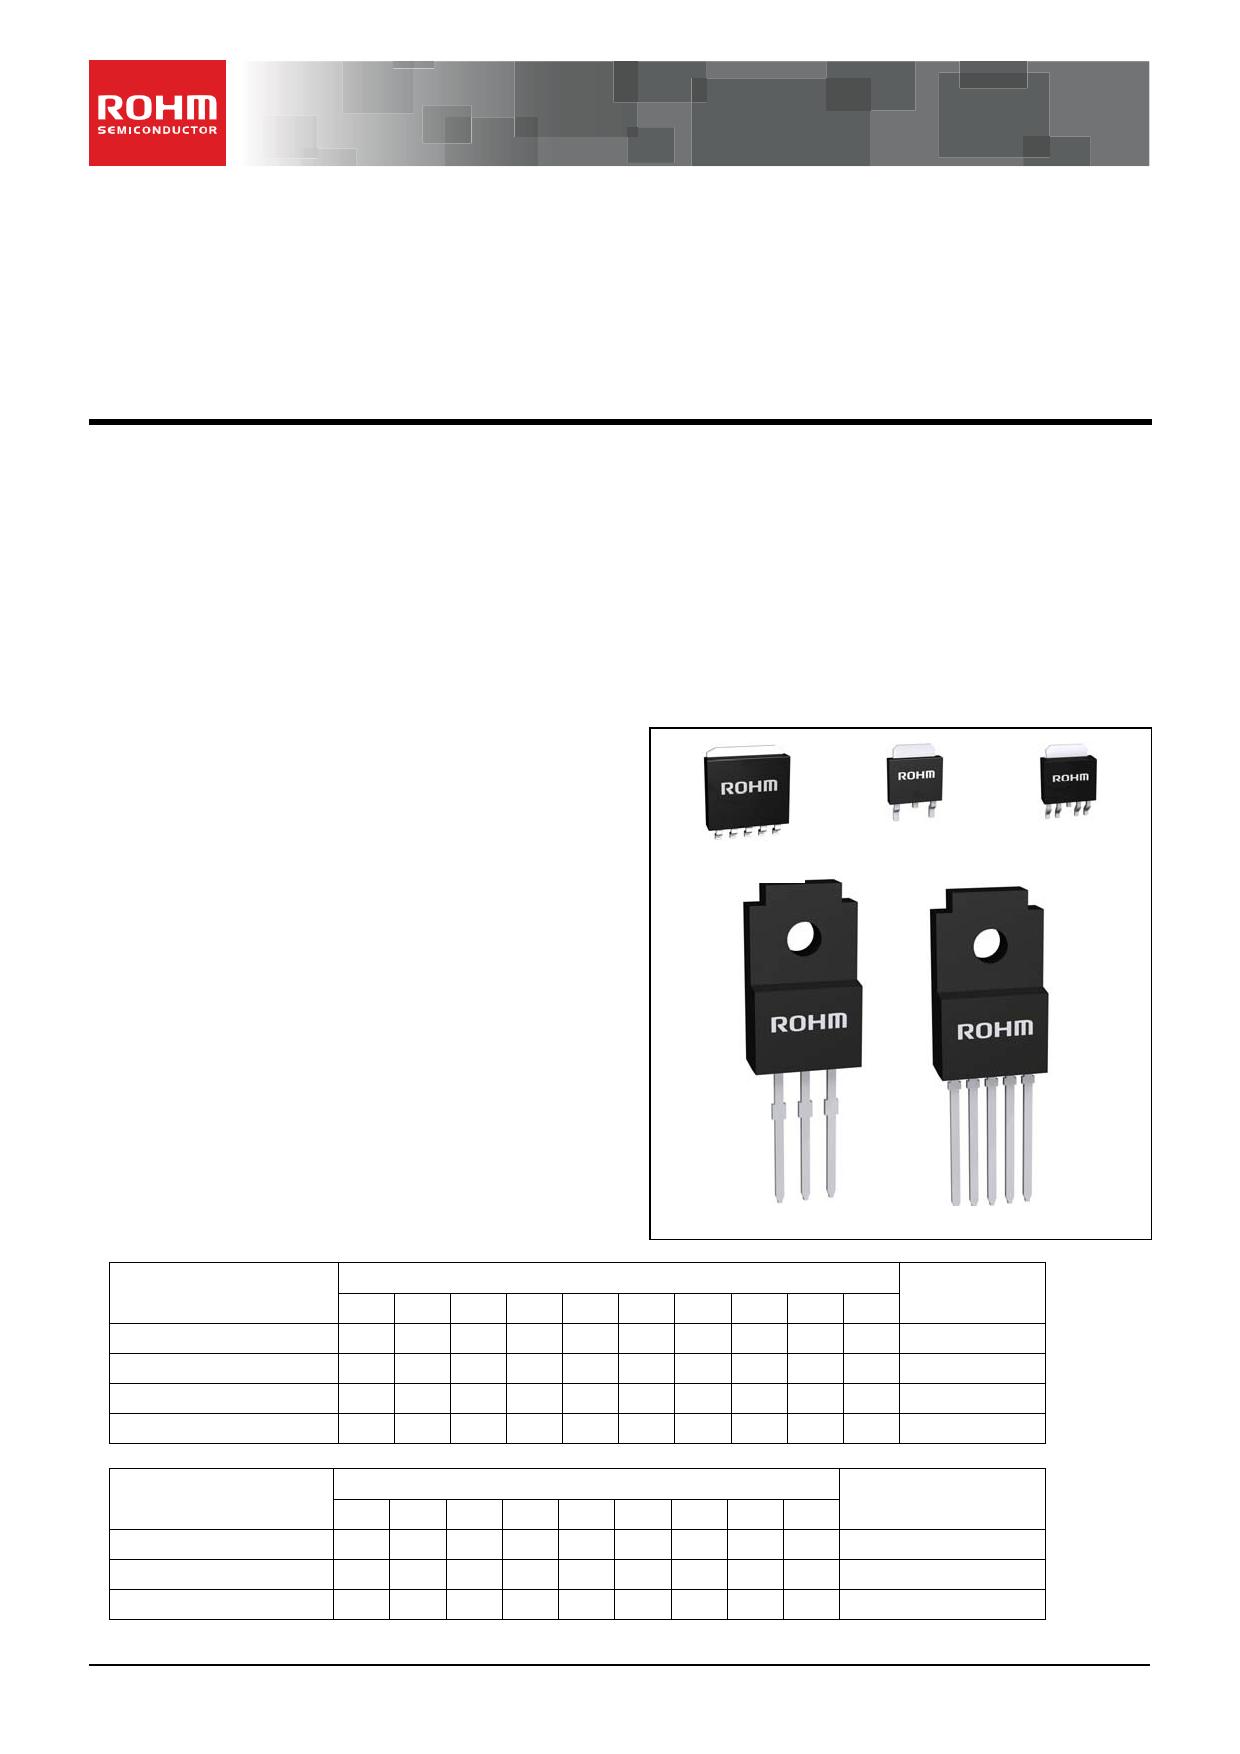 BA033CC0WT datasheet